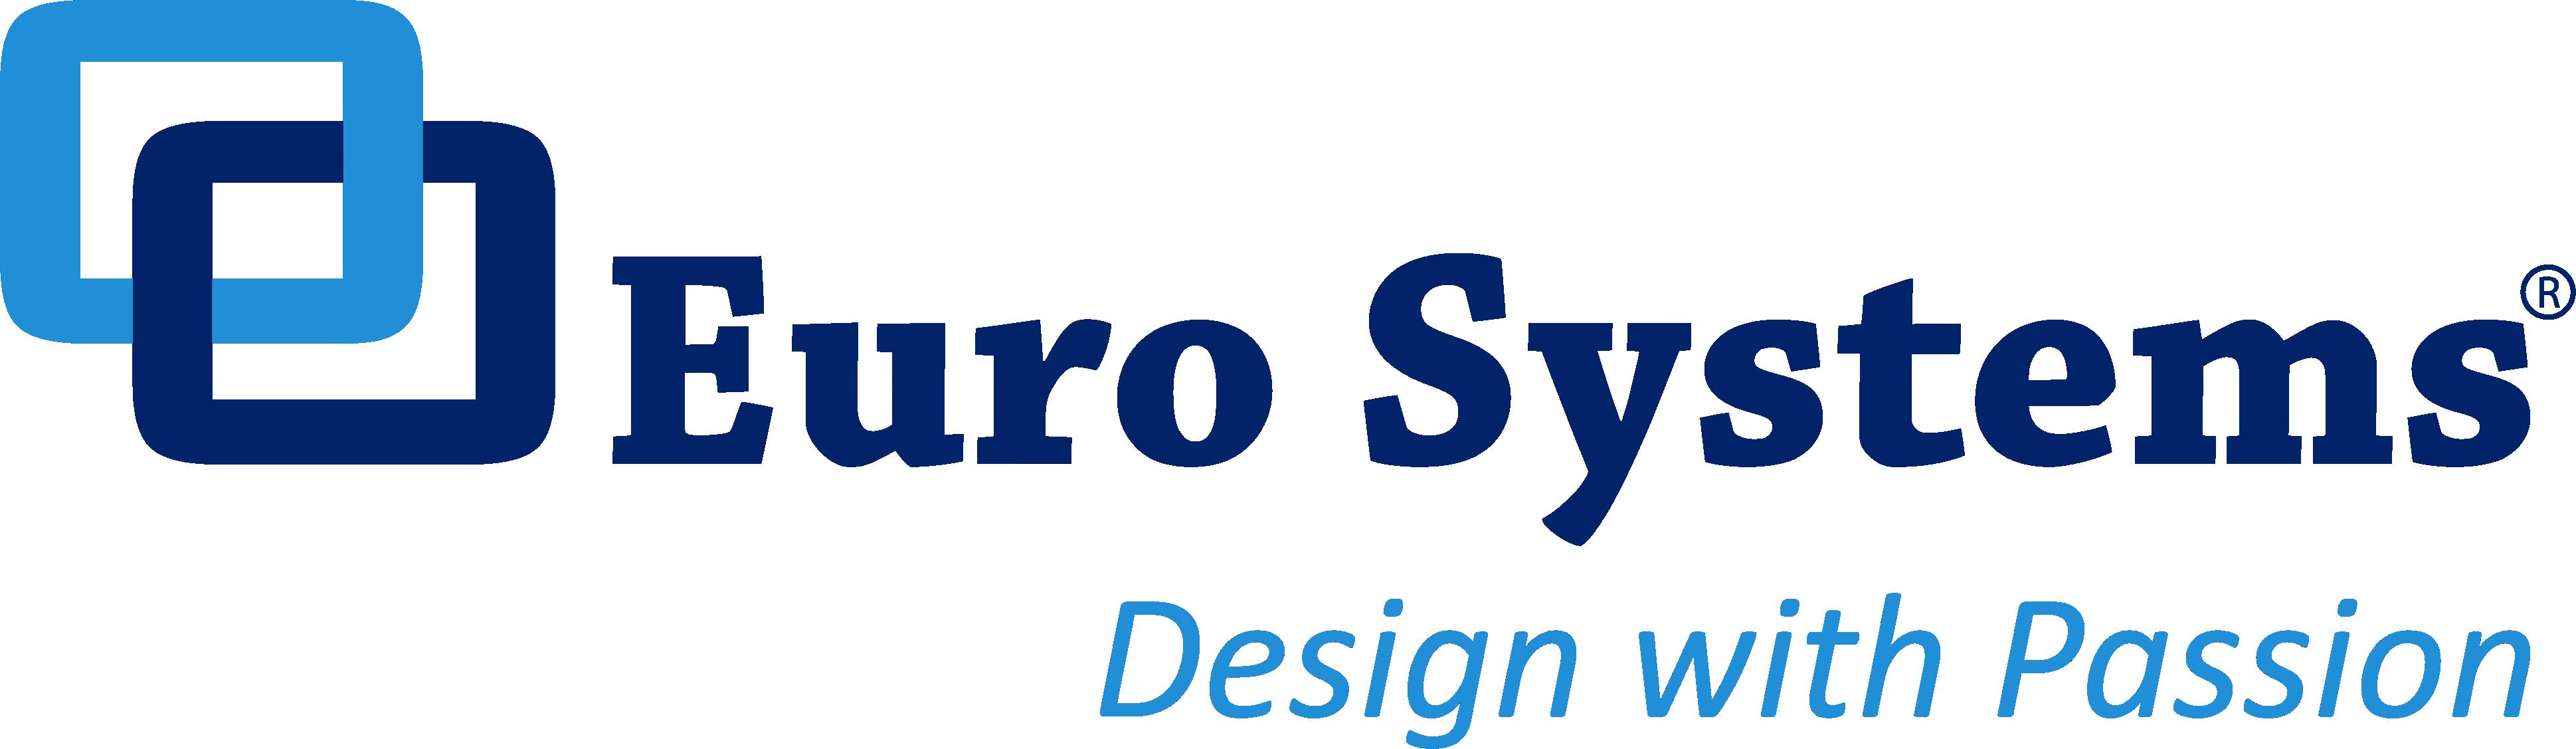 EuroSystemsLogo_PNG